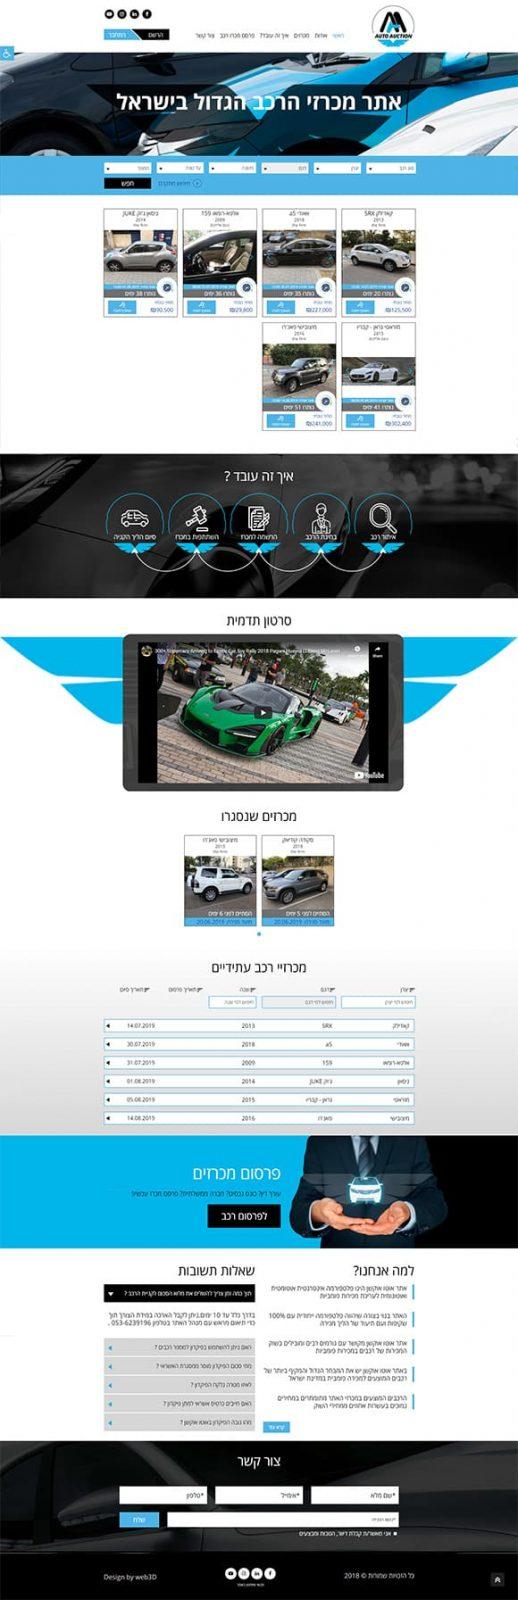 Auto Auction, פיתוח אתר, עיצוב אתר, קידום אורגני, קידום אתר